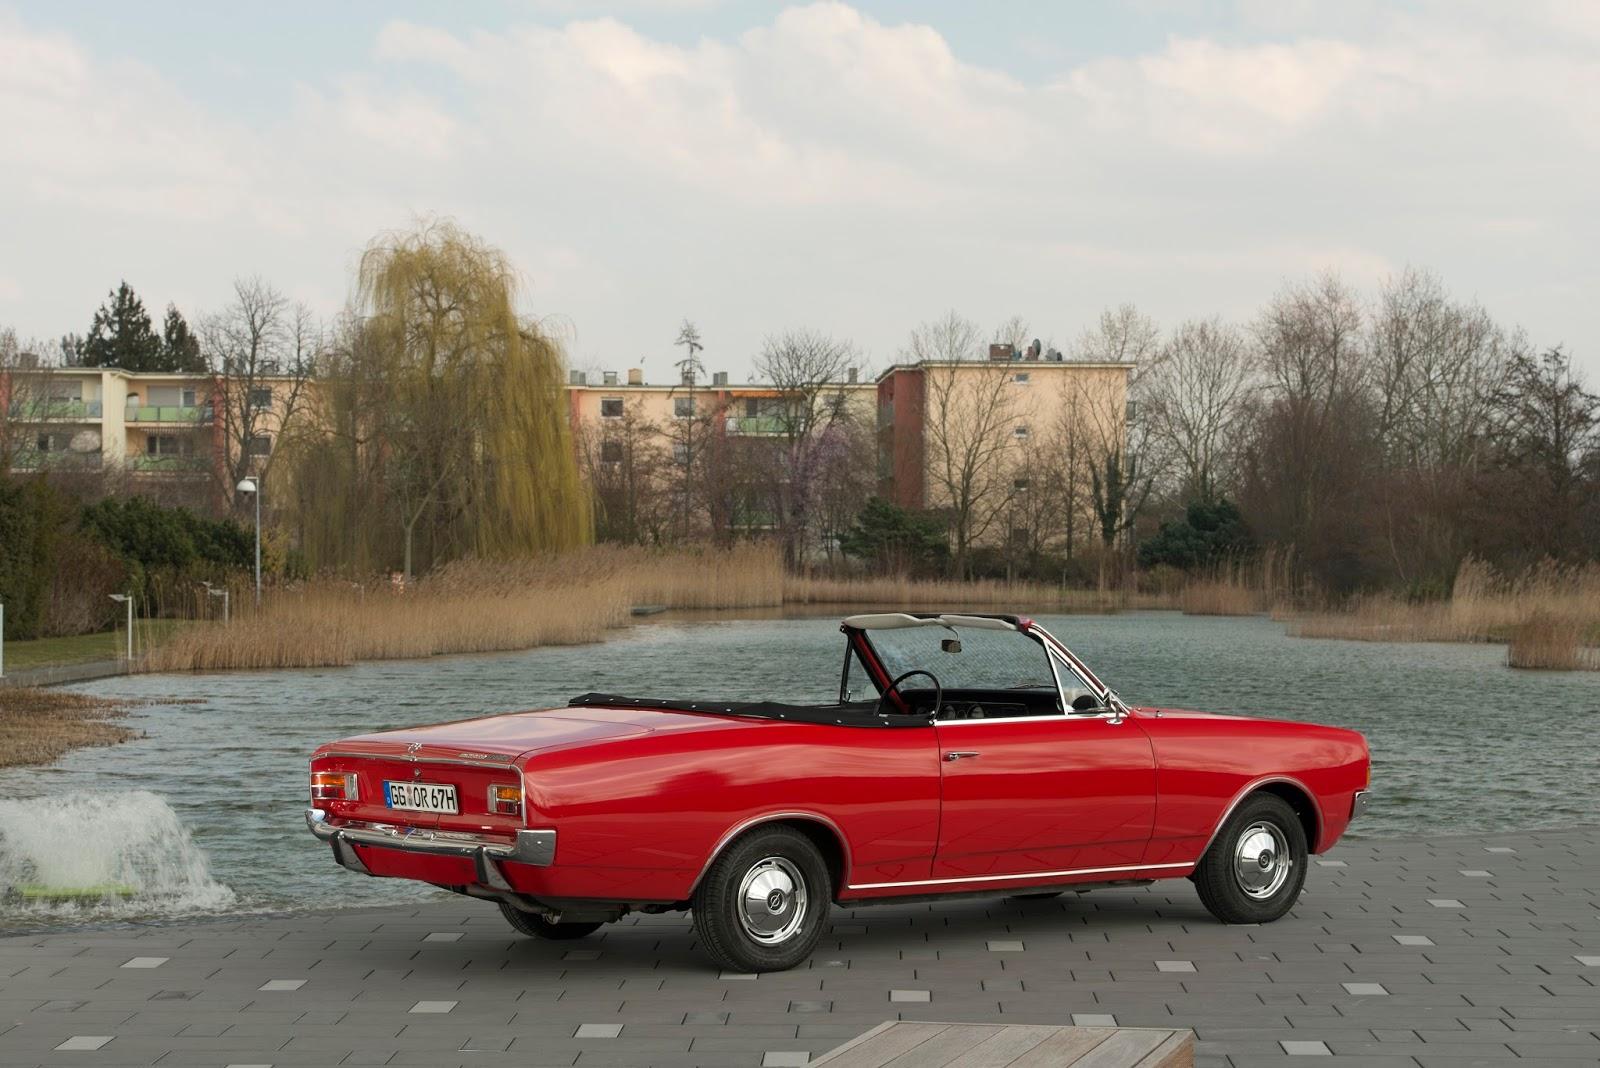 Opel Rallye Hessen Th25C325BCringen 301762 H Πλούσια Κληρονομιά των Opel Cabrio cabrio, Opel, Opel 8/25 hp, Opel Cascada, Opel Olympia, Opel Record, Opel Super 6